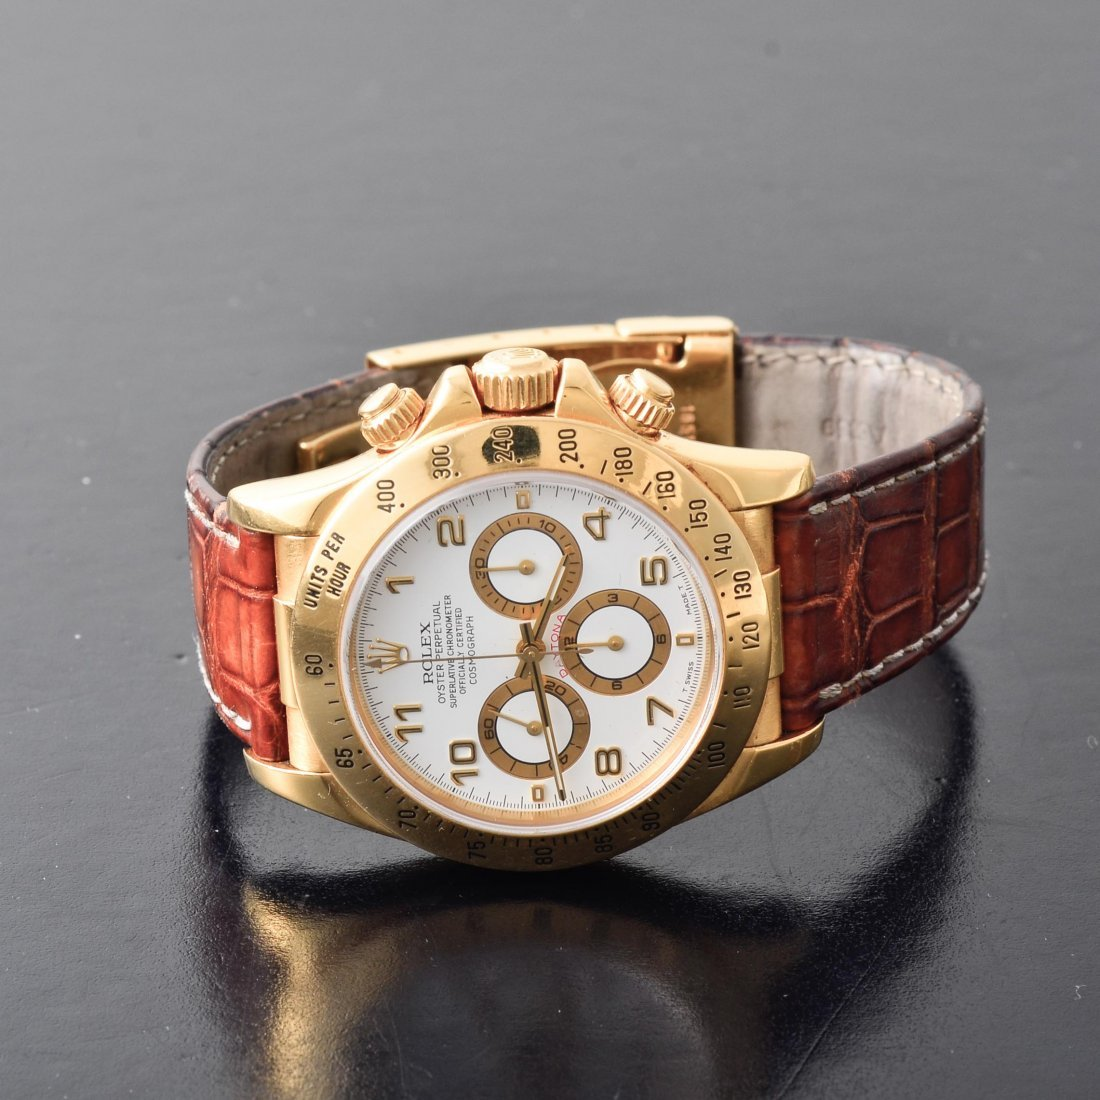 Rolex Gold Daytona Man's Watch